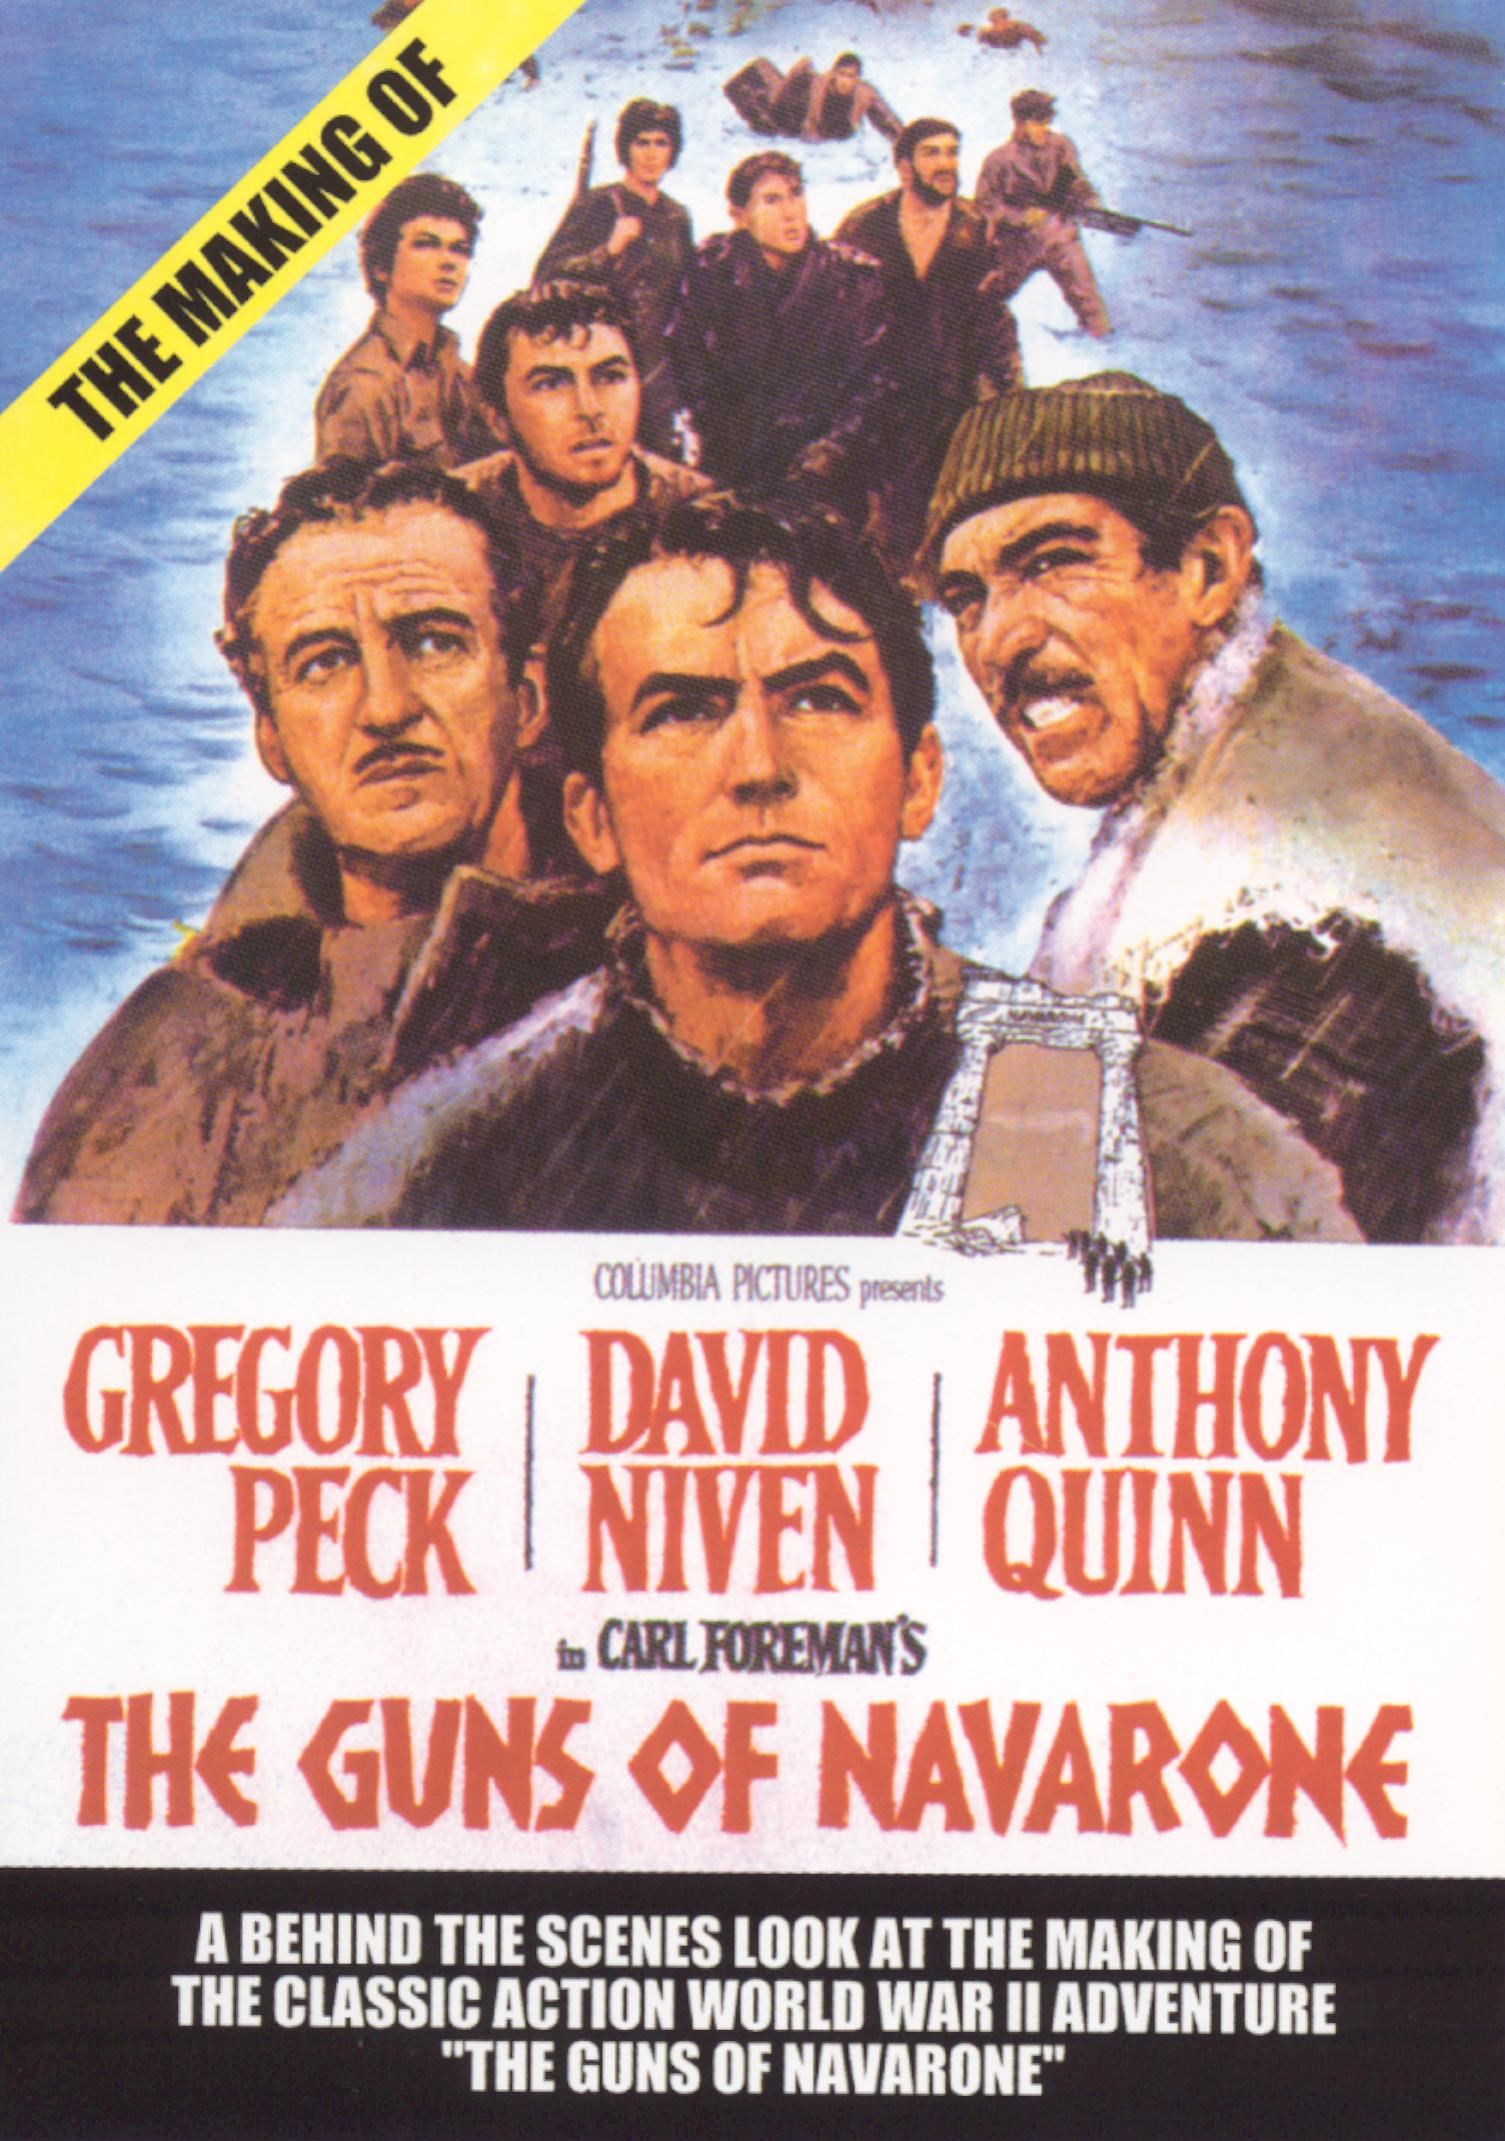 The Making of The Guns of Navarone